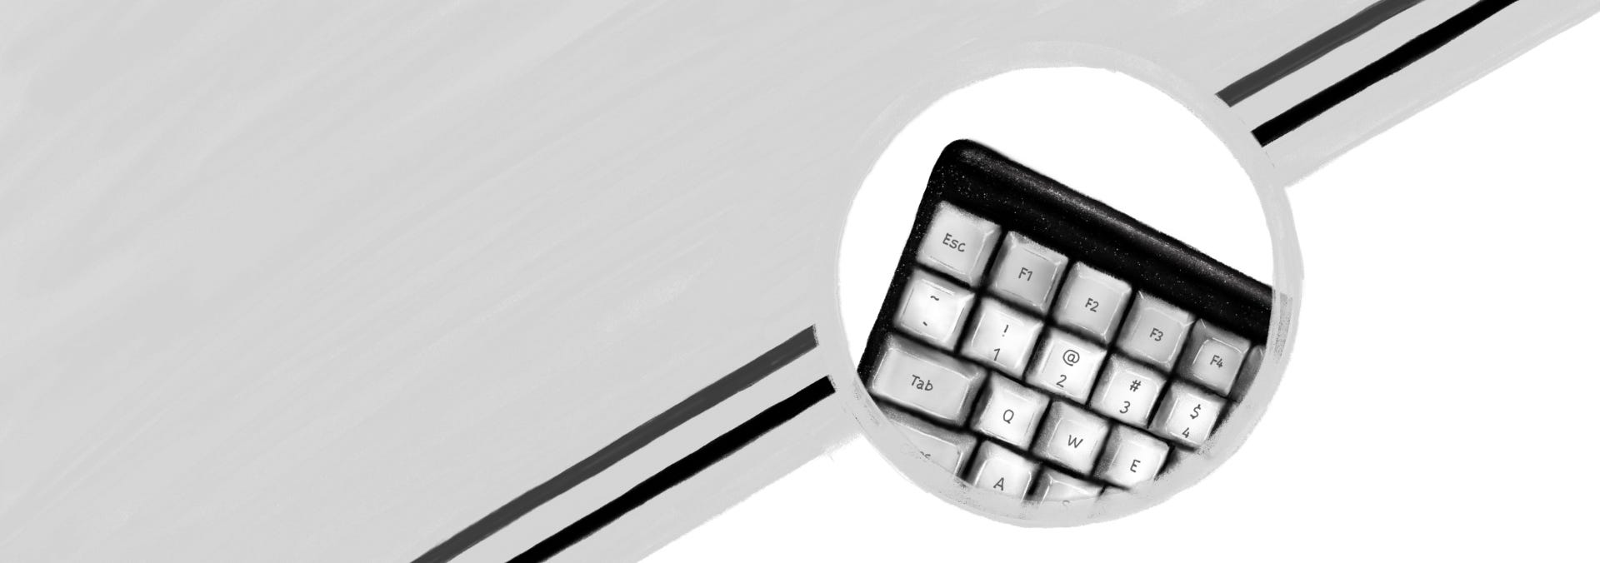 Launch keyboard background hero